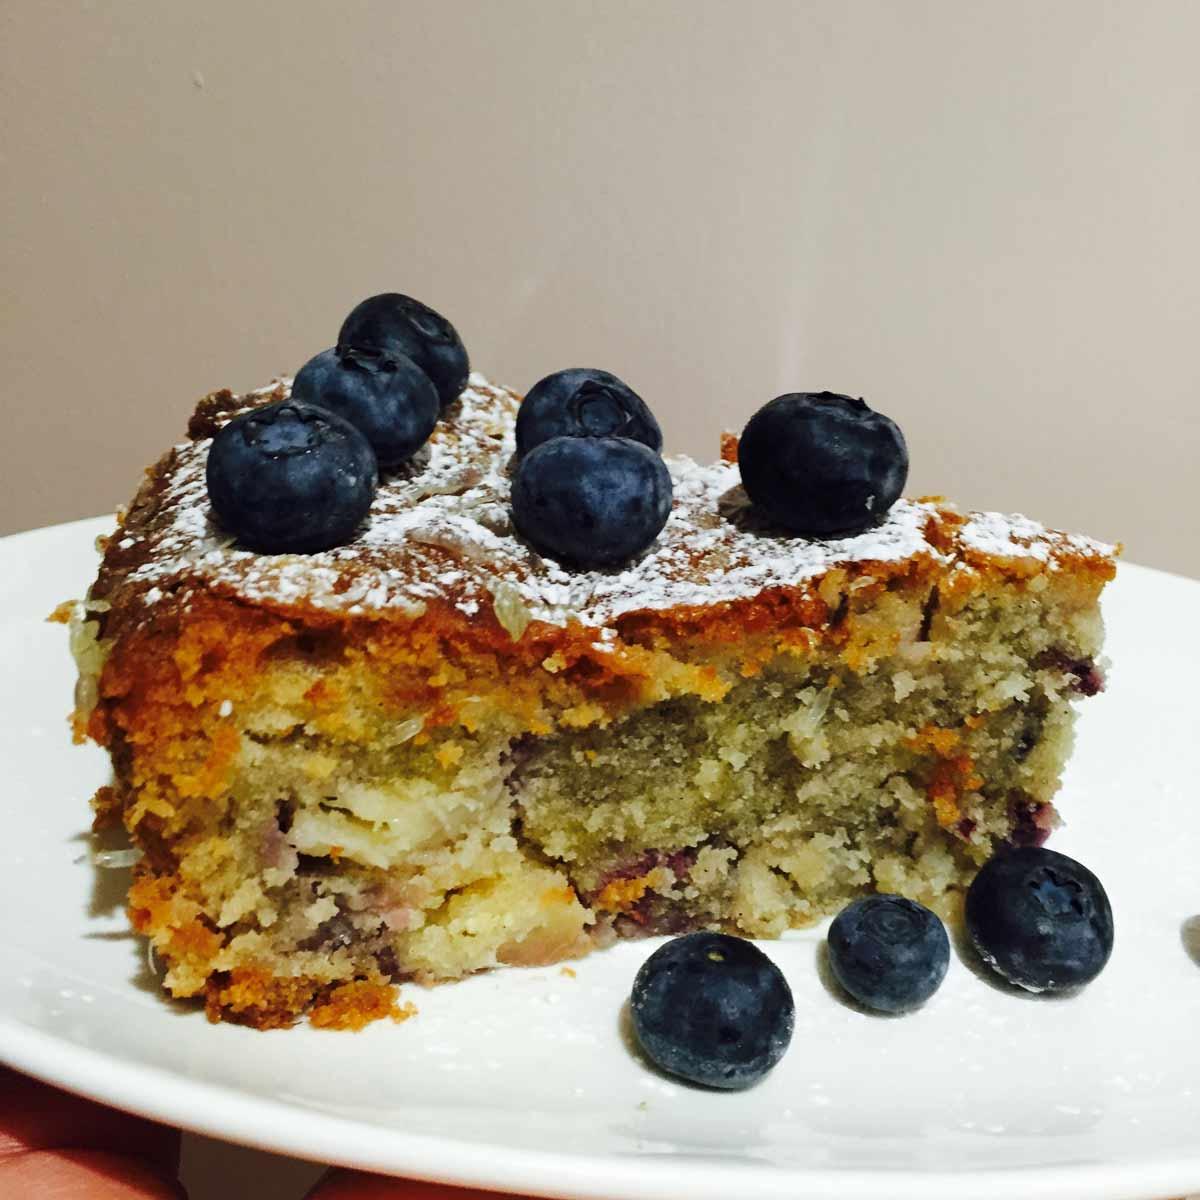 A slice of pineapple, berries & coconut cake